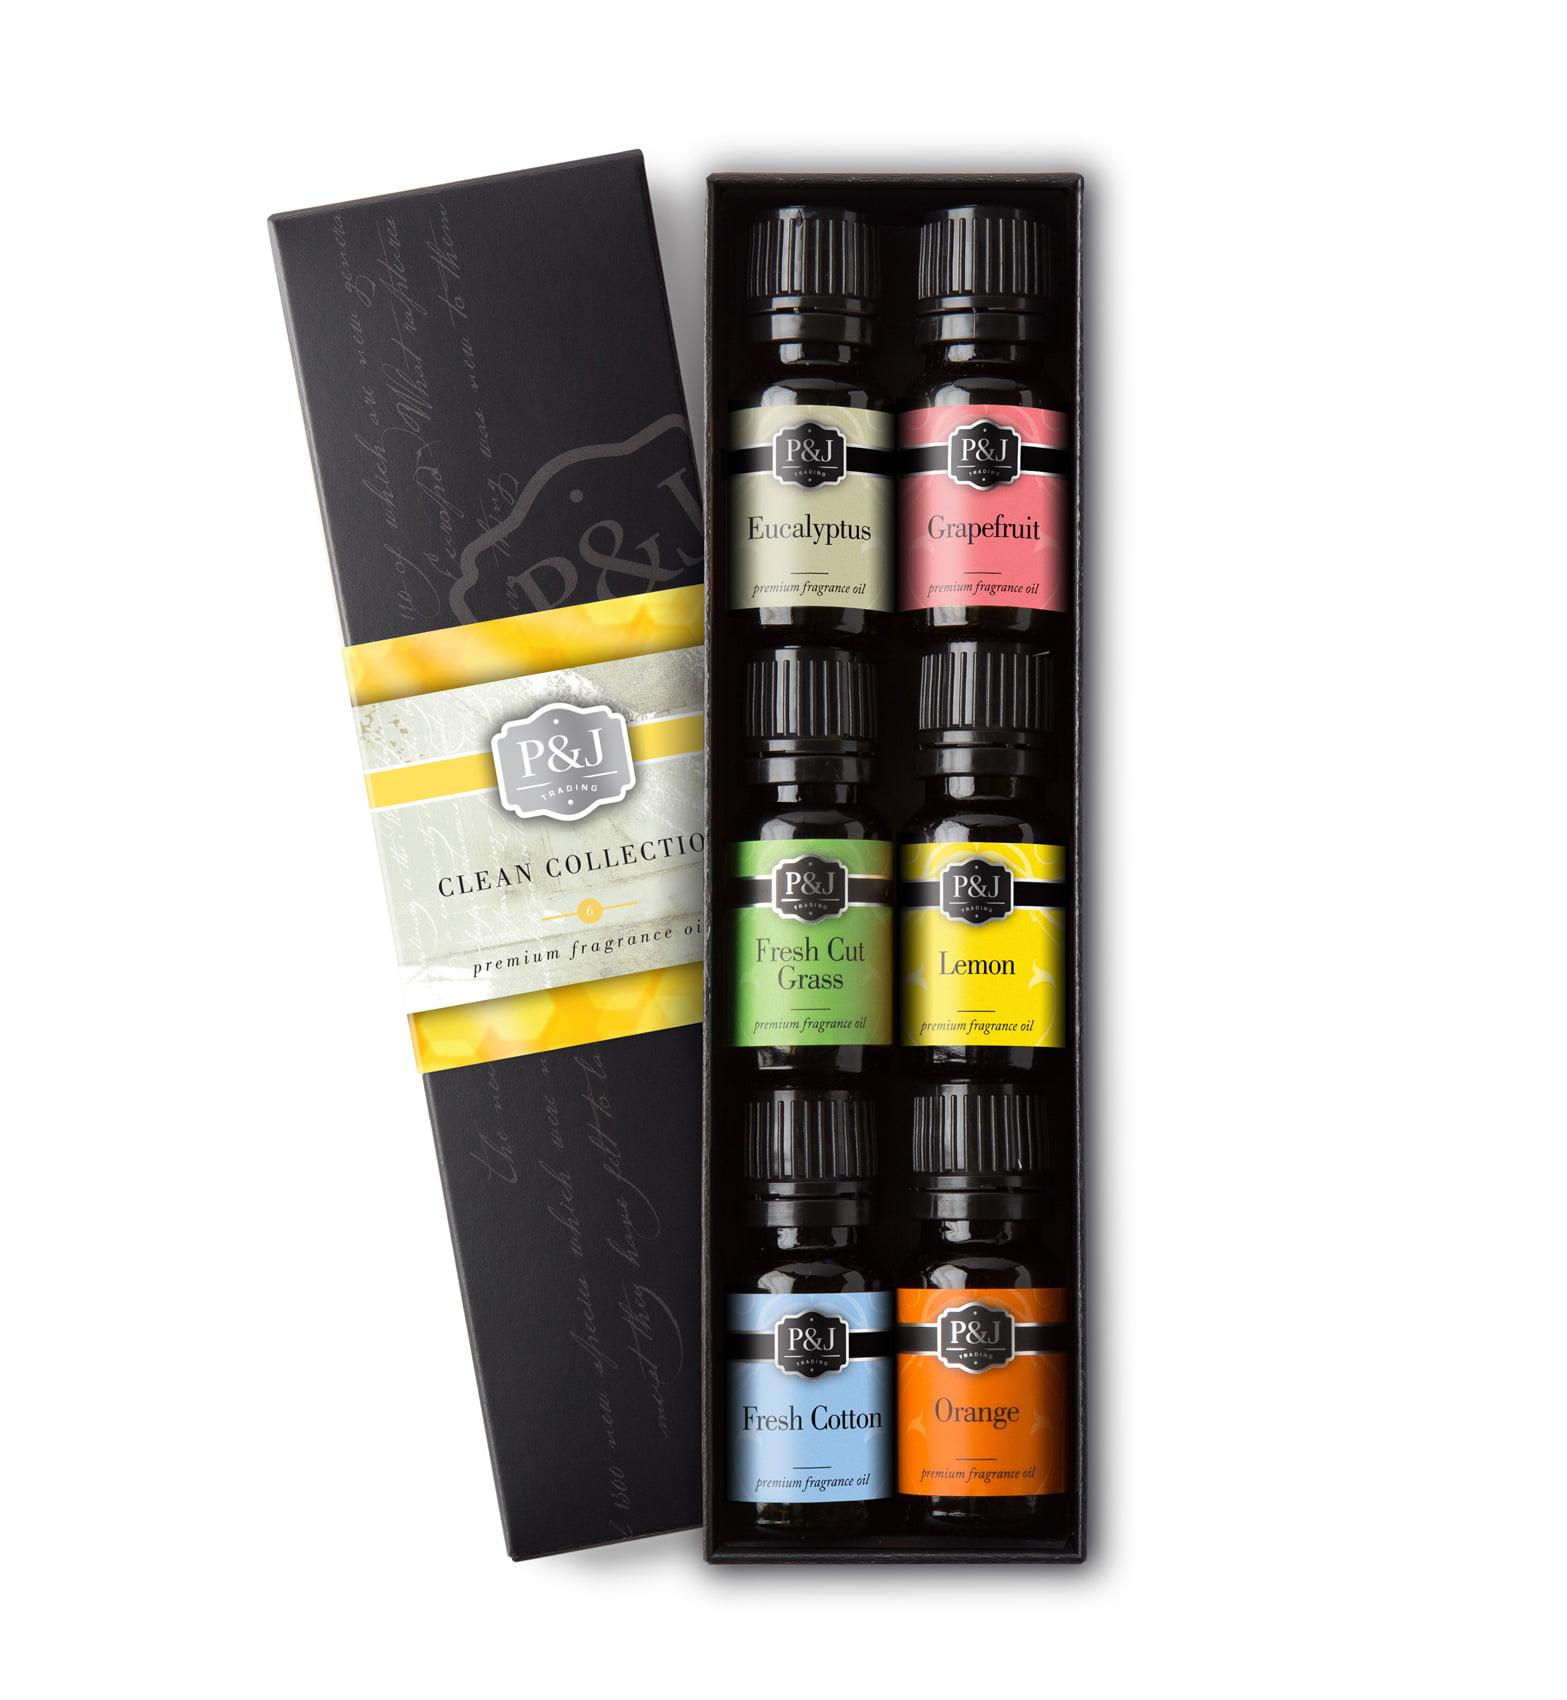 Clean Set of 6 Fragrance Oils Premium Grade Scented Oil 10ml Fresh Cotton, Lemon, Orange,... by P&J Trading